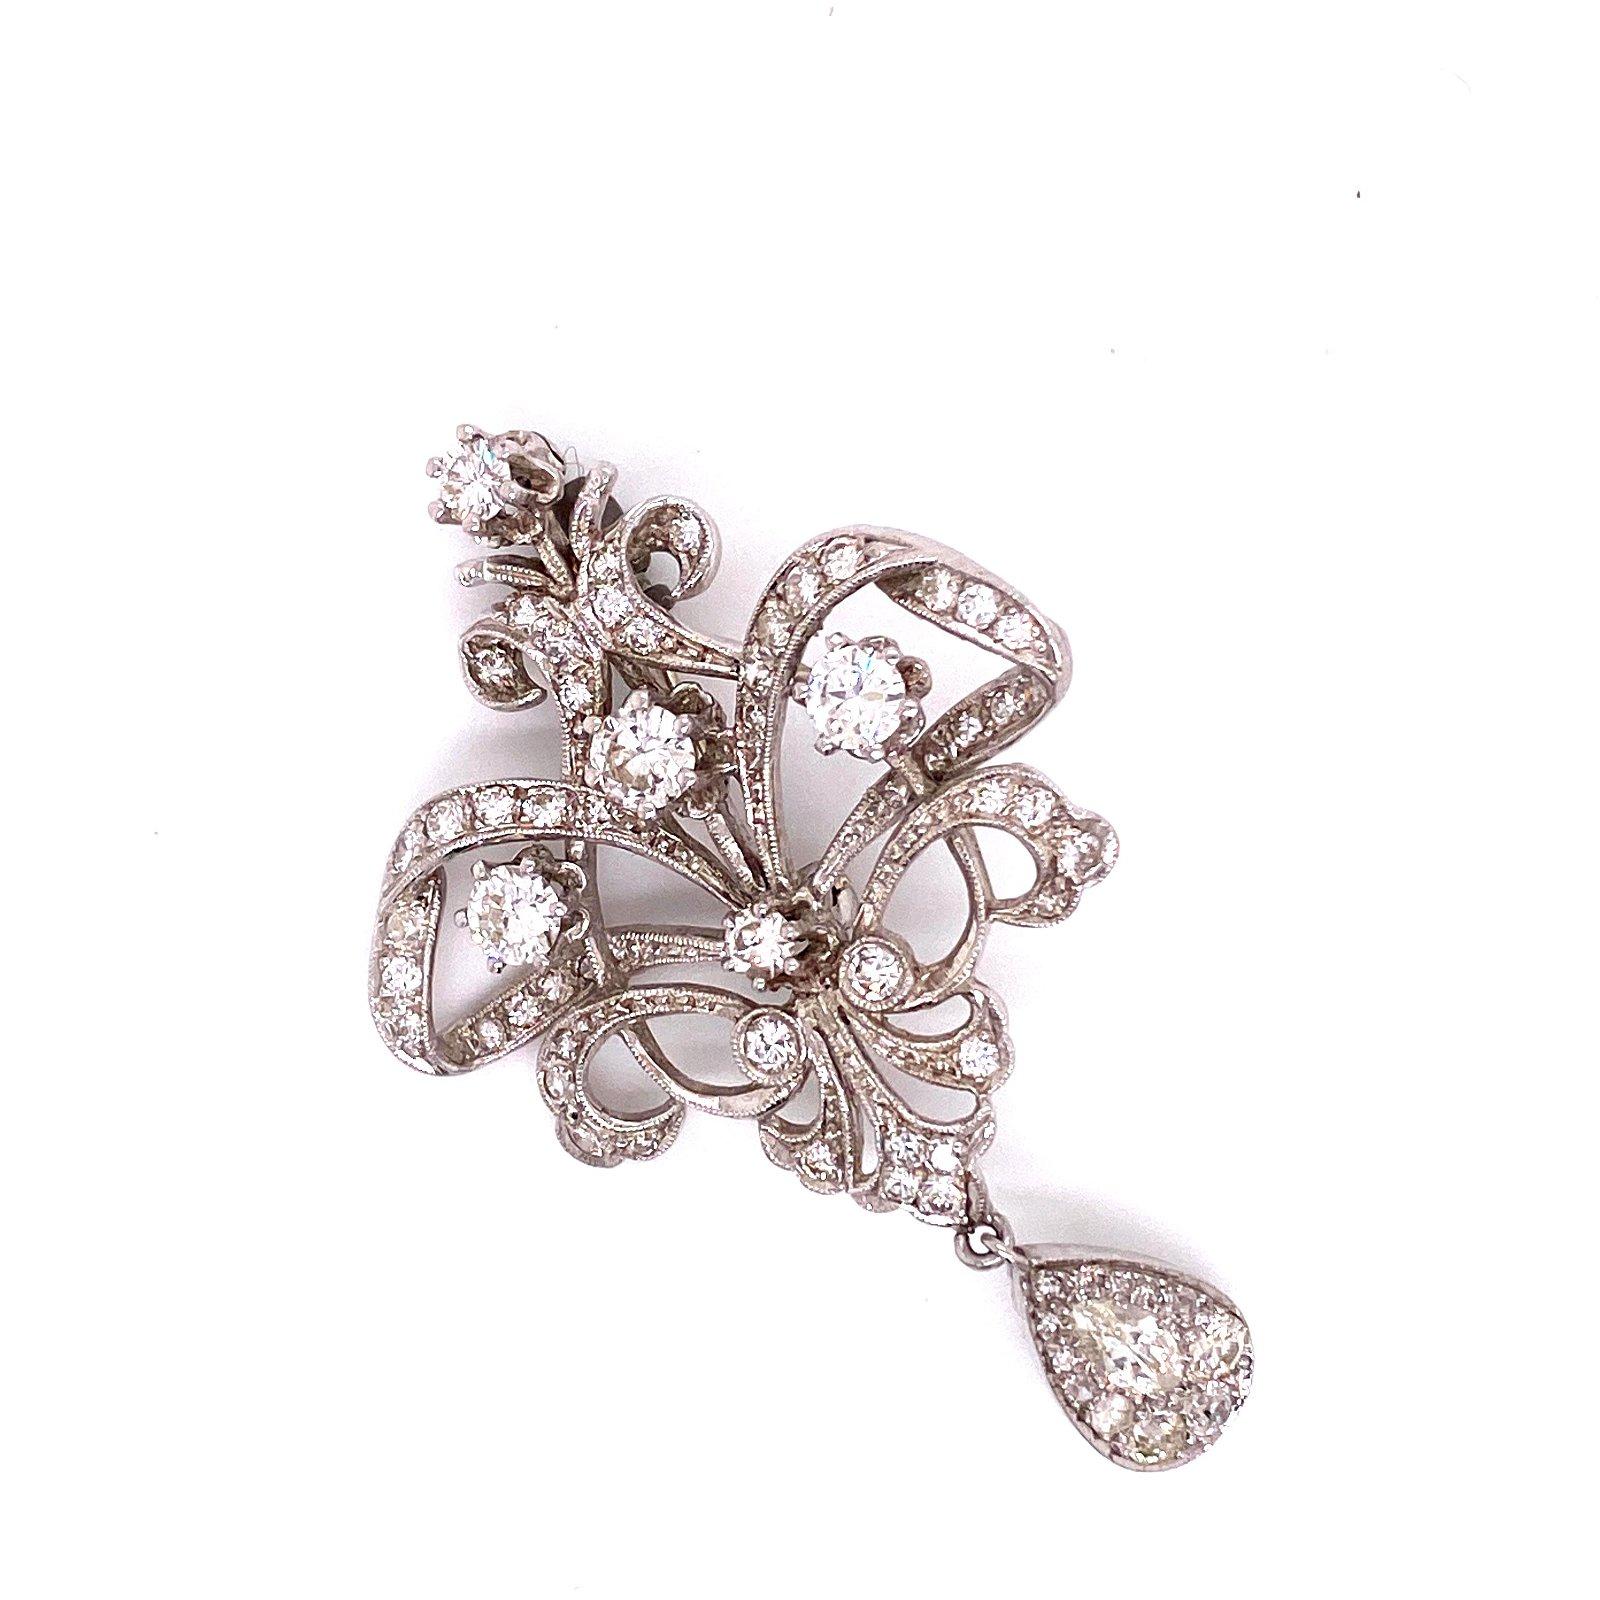 Diamond 18k White Gold Victorian Revival Pin